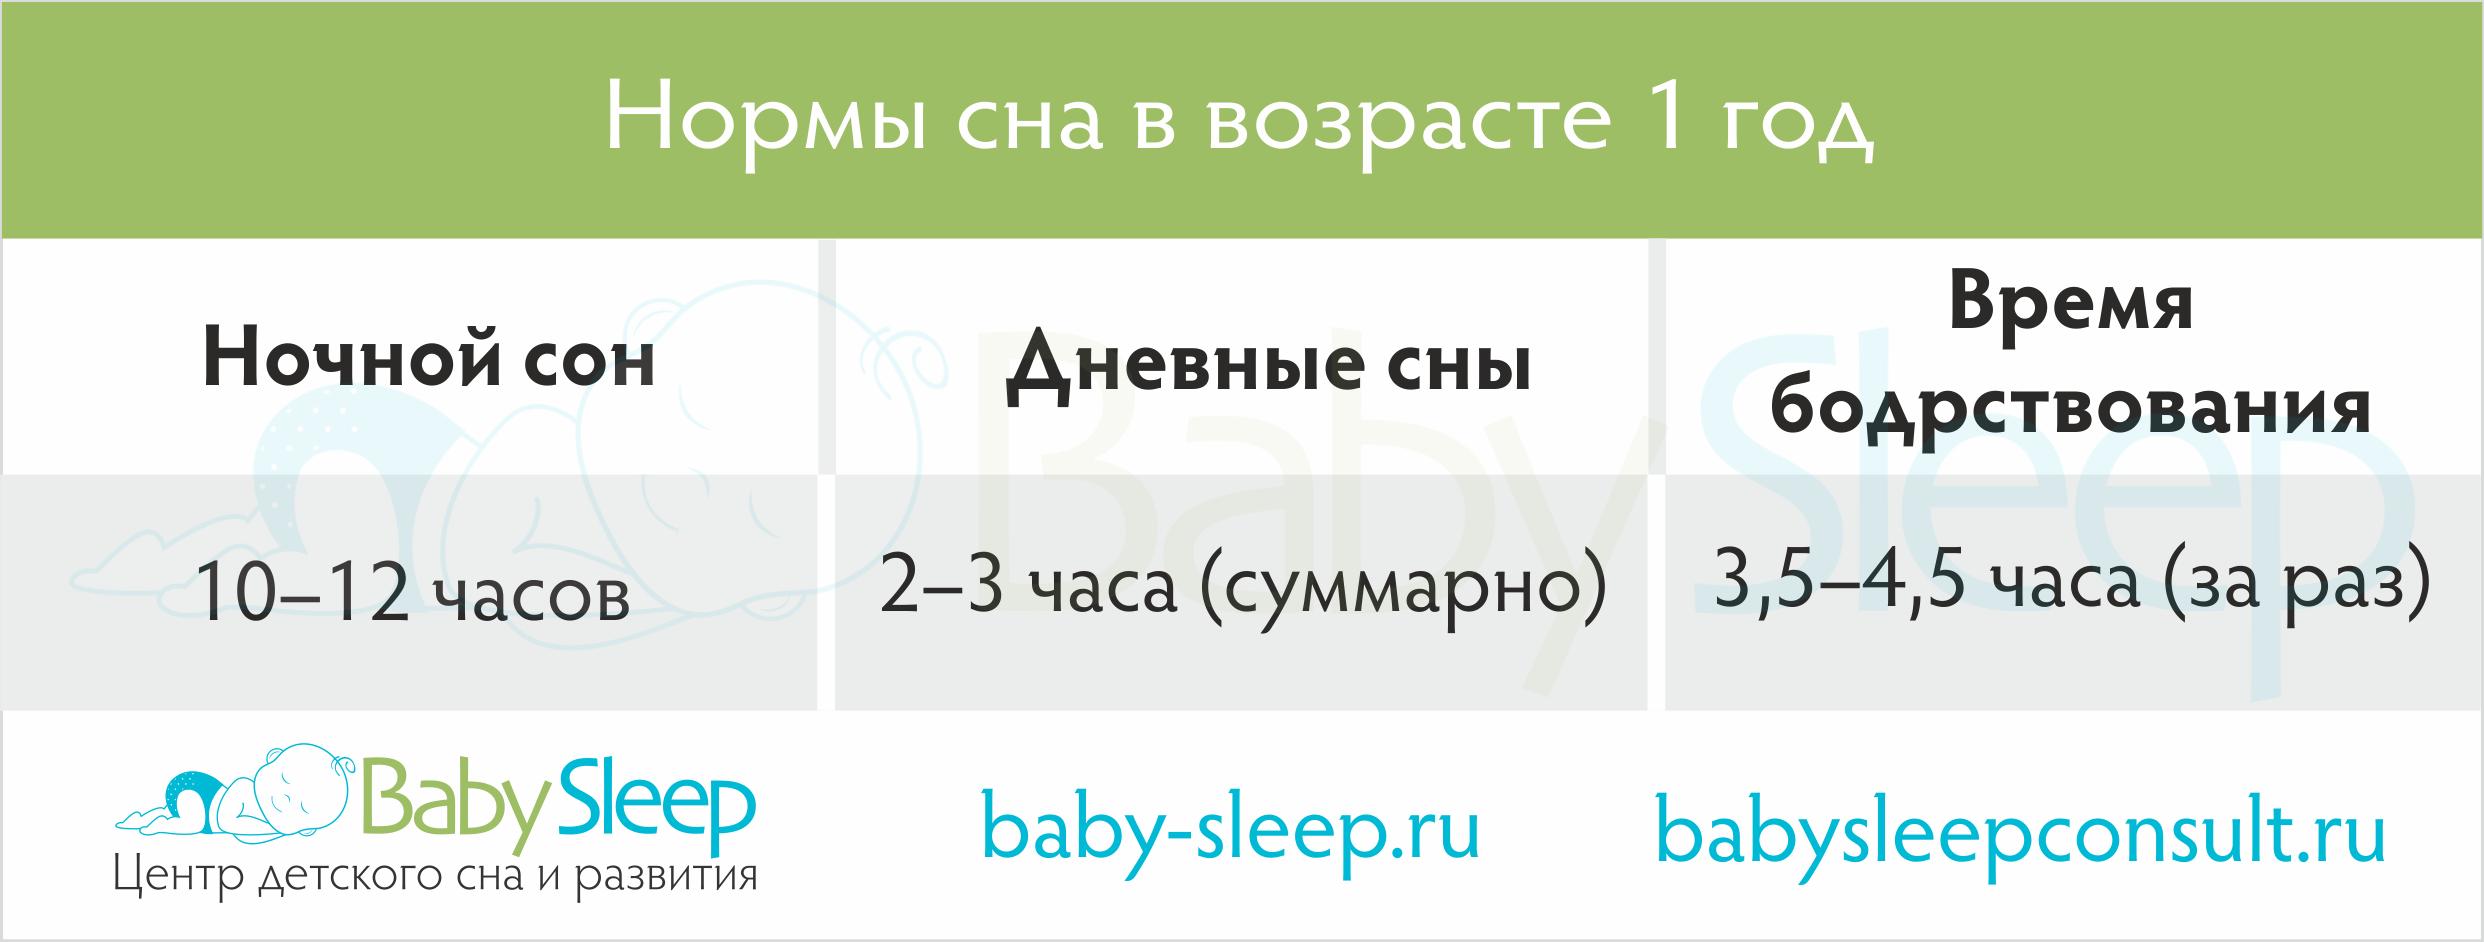 Специфика сна у детей от 0 до 12 месяцев